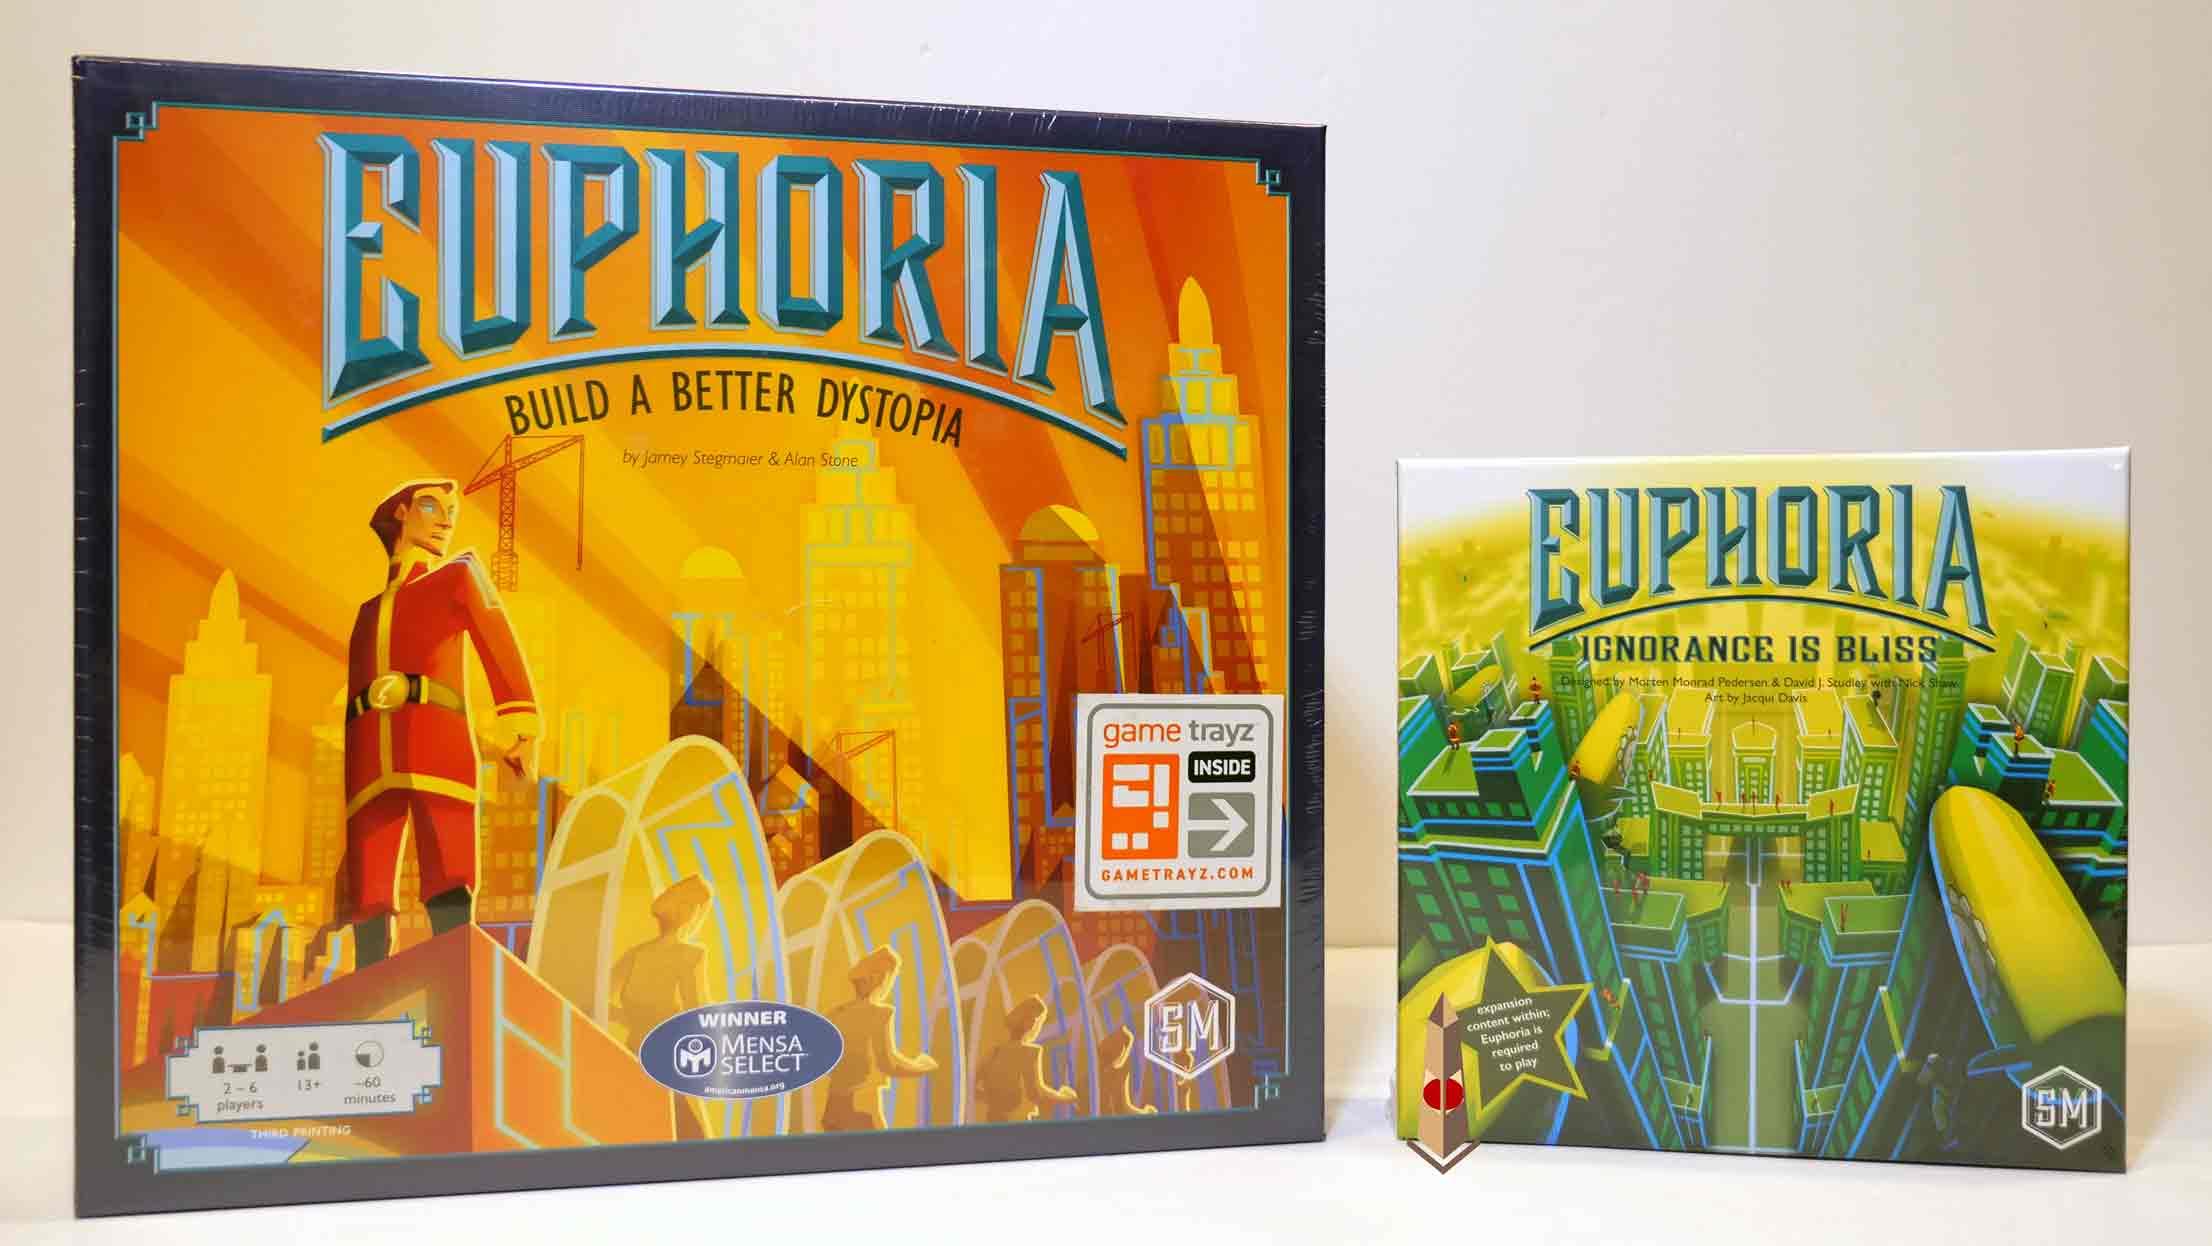 euphoria-facebook